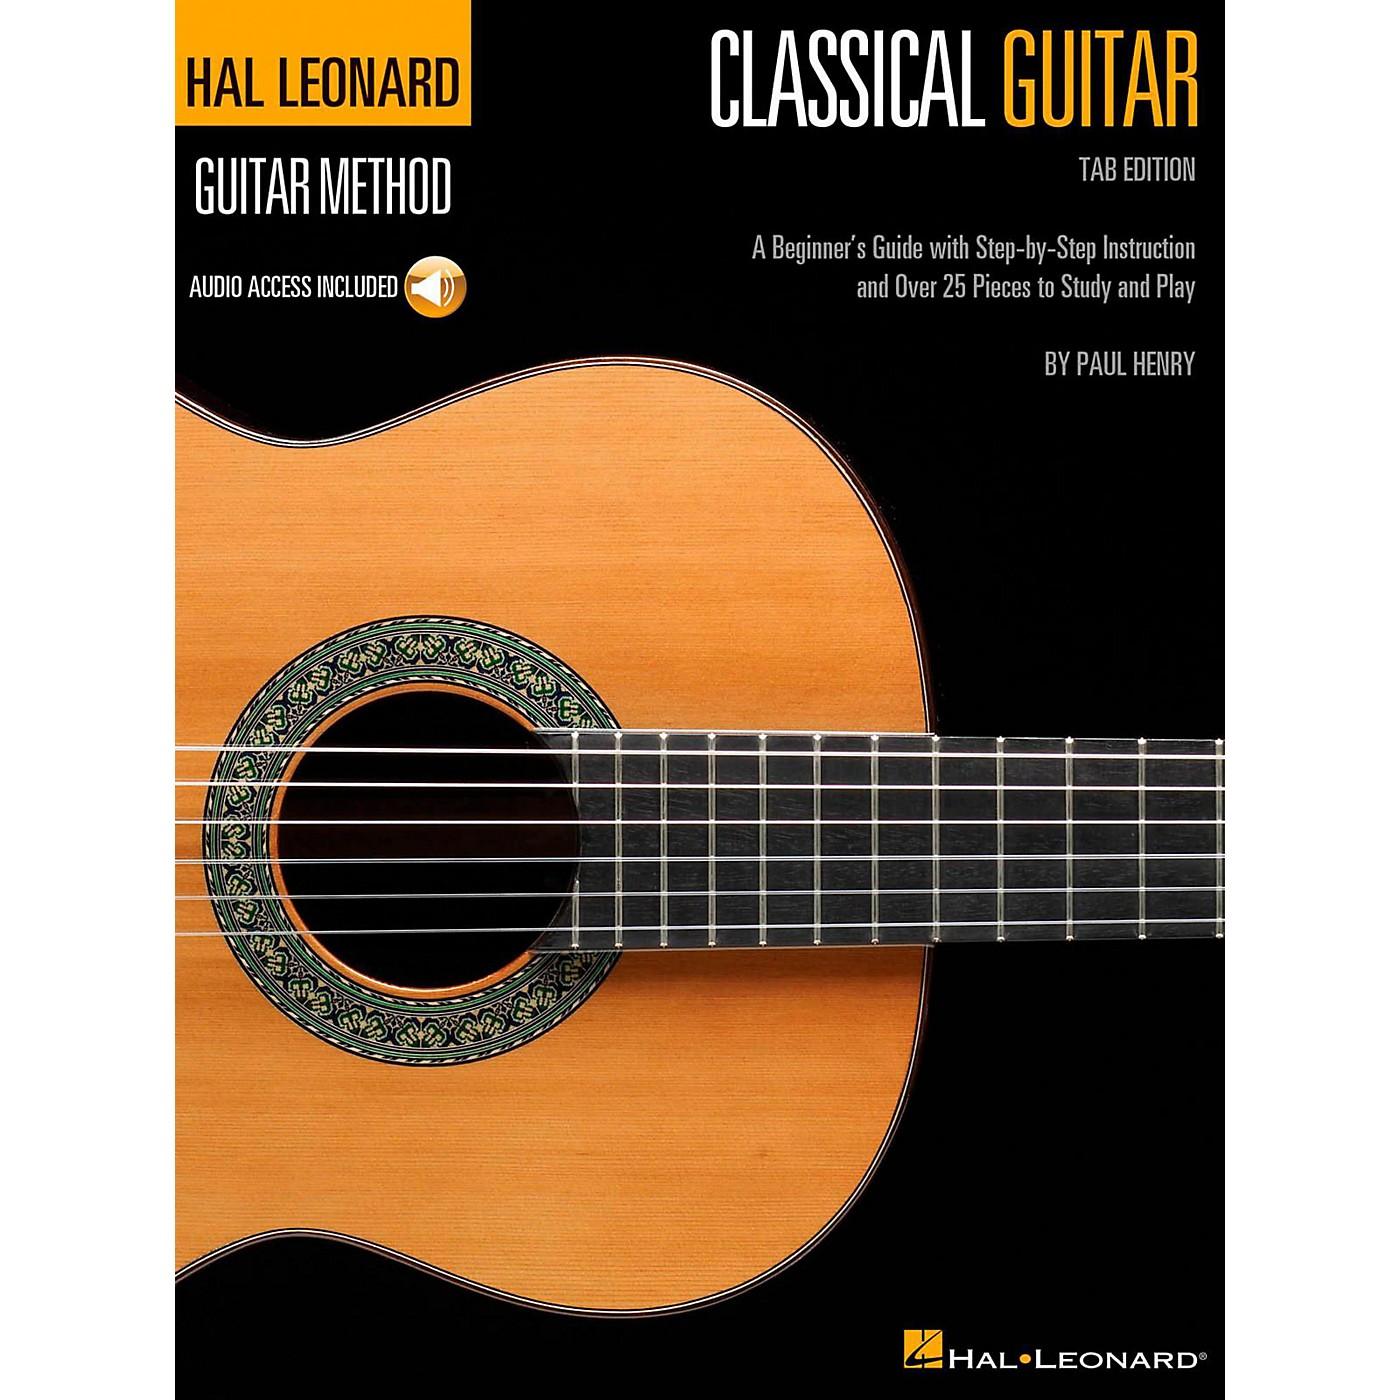 Hal Leonard Classical Guitar - Hal Leonard Guitar Method Series (Book/Online Audio) Tab Edition thumbnail